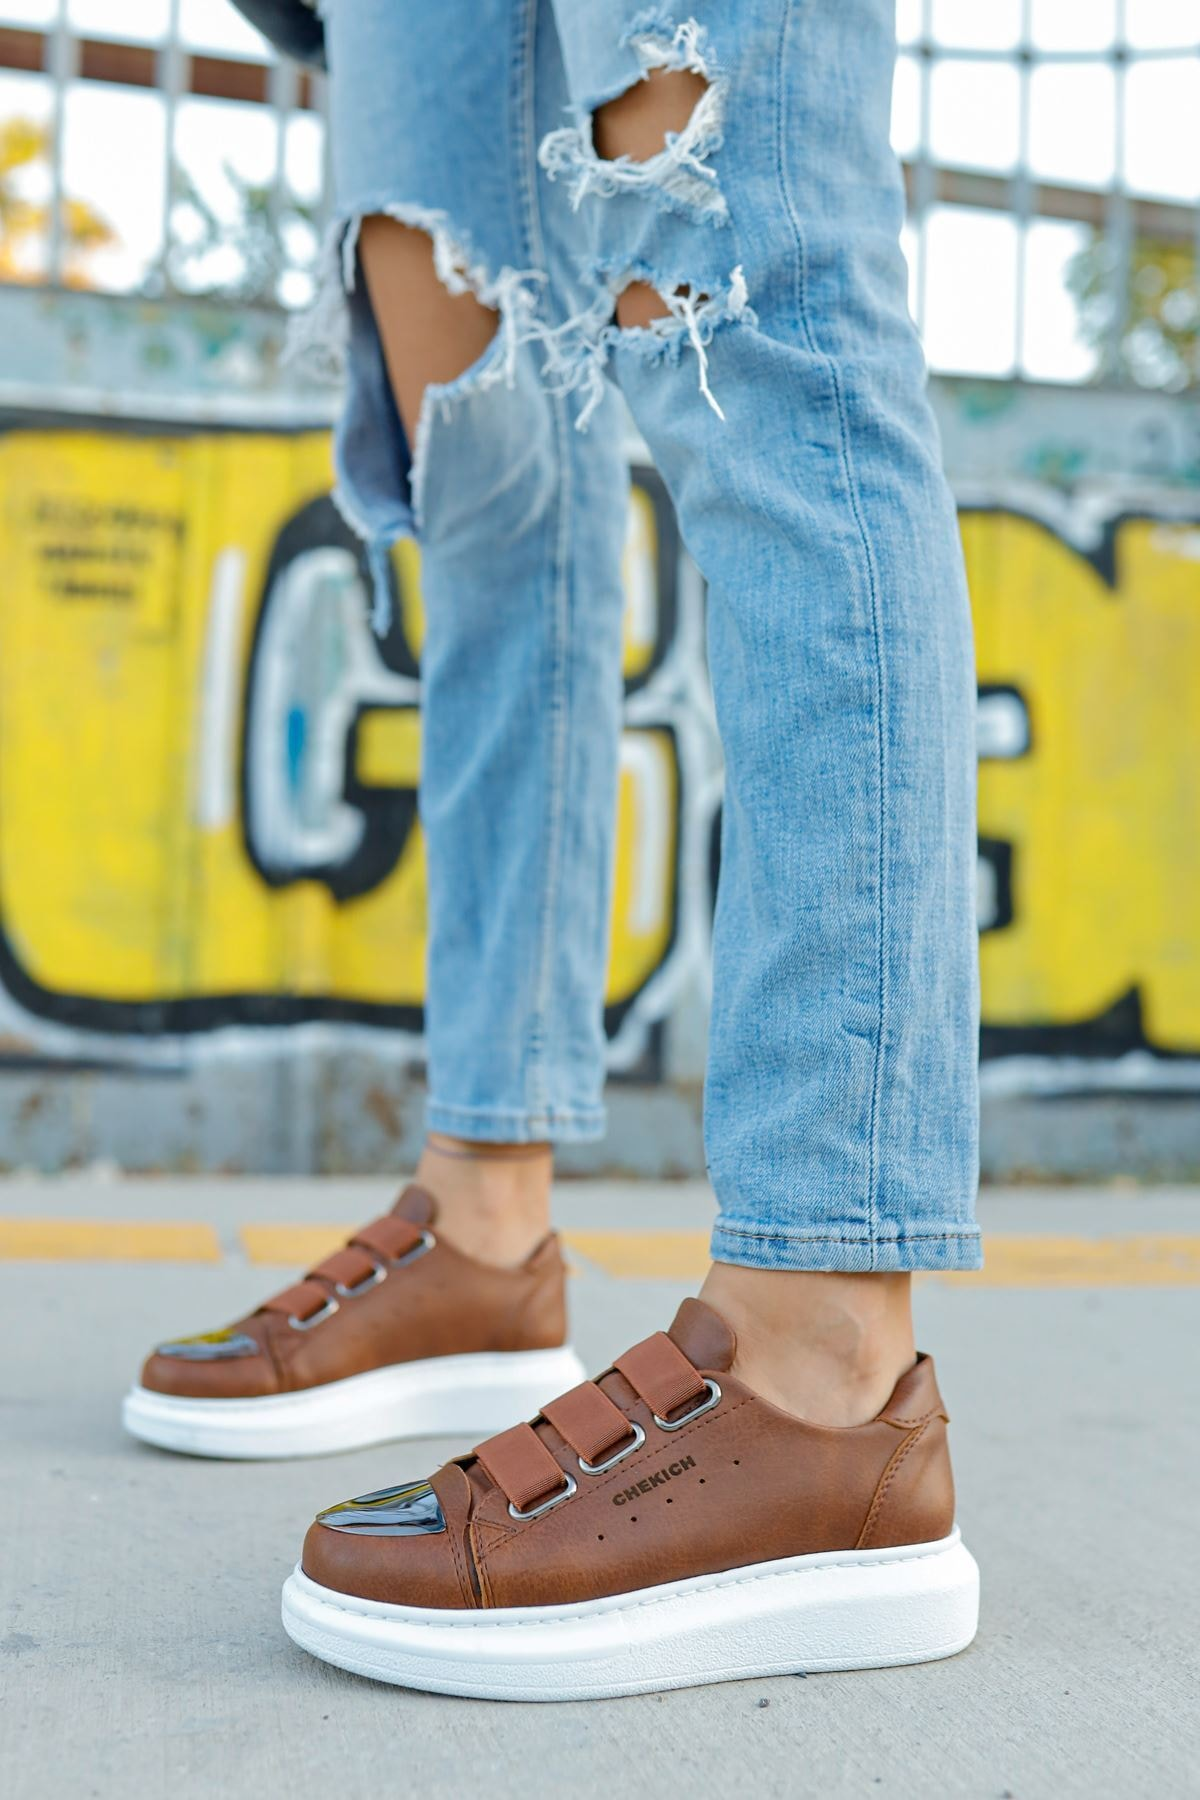 Chekich Ch251 Bt Kadın Ayakkabı Taba 2